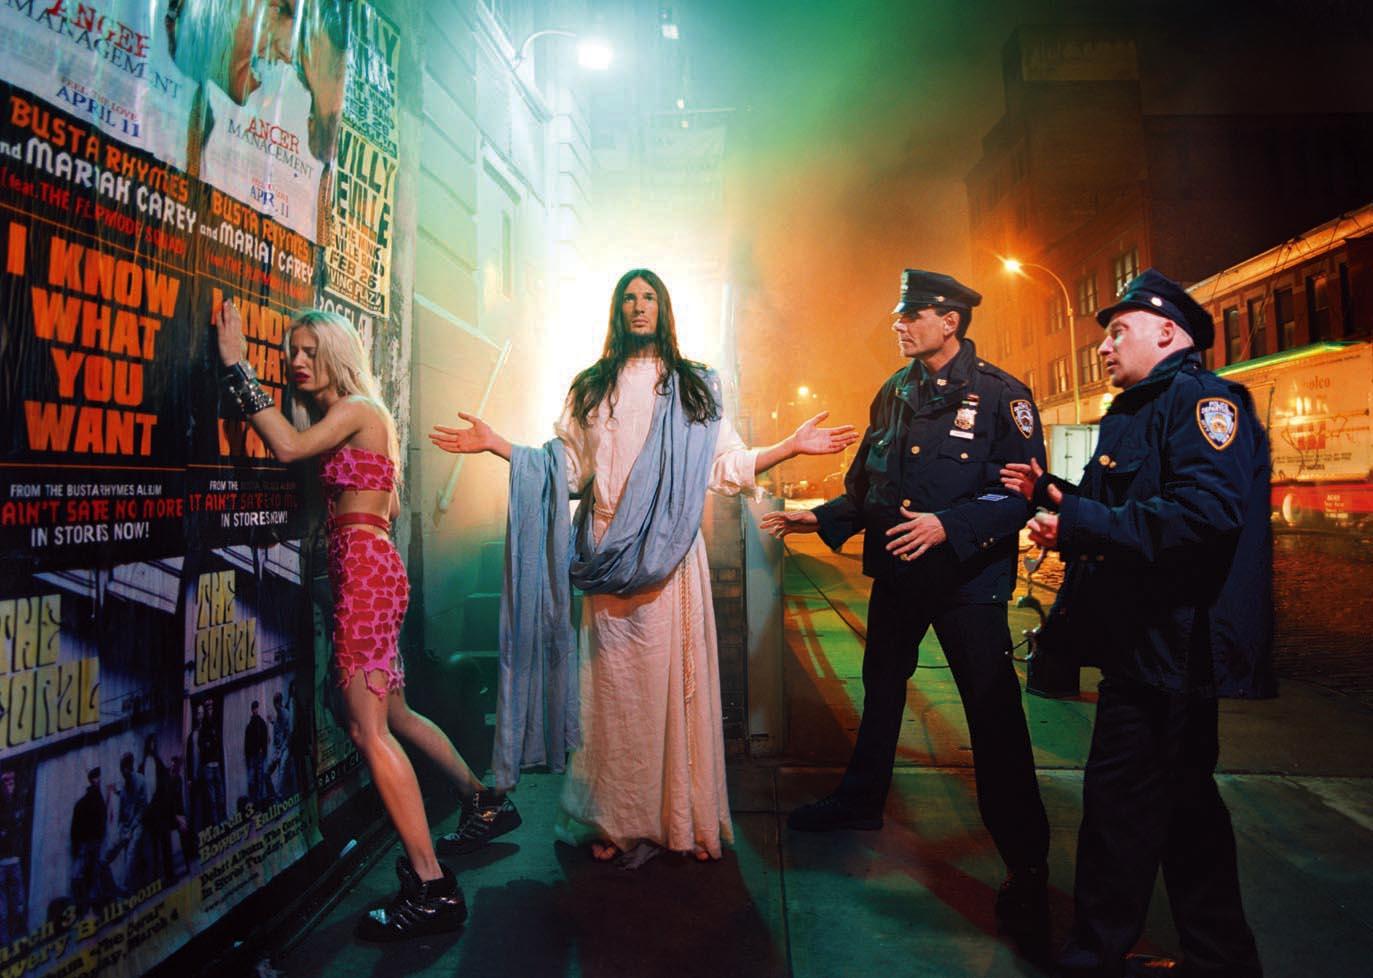 Jesus is my Homeboy by David LaChapelle